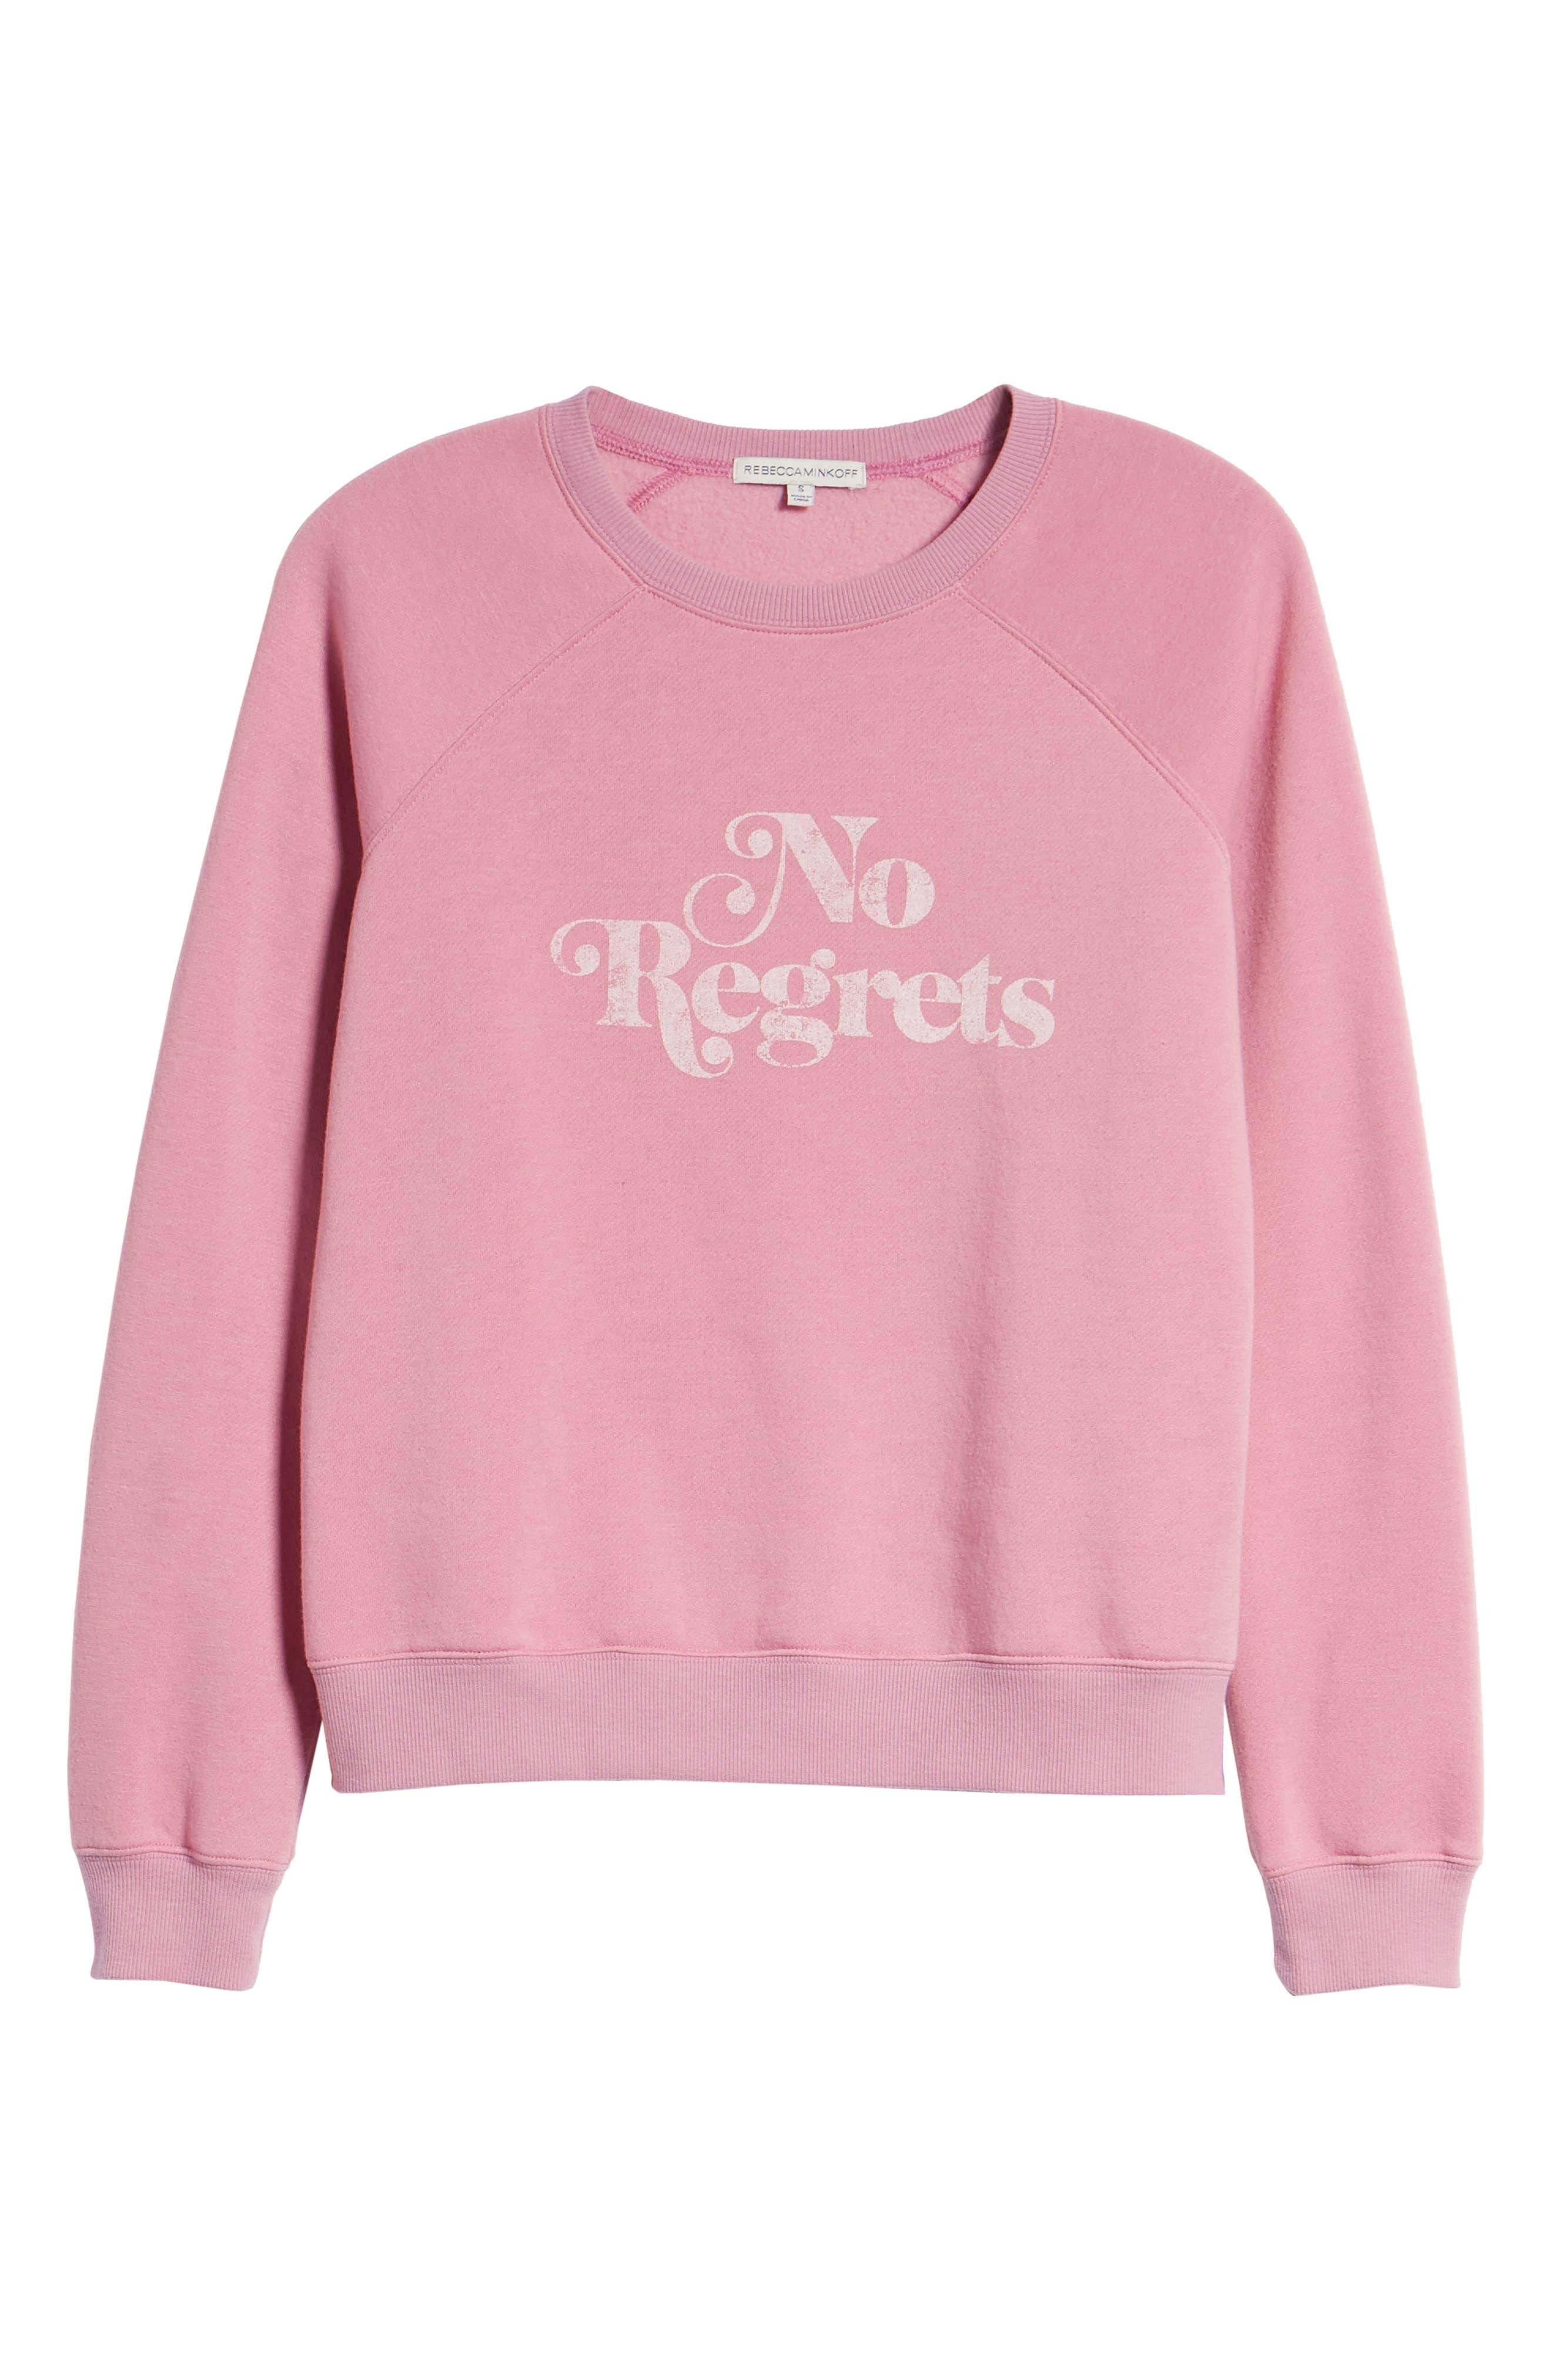 No Regrets Sweatshirt,                             Alternate thumbnail 6, color,                             664